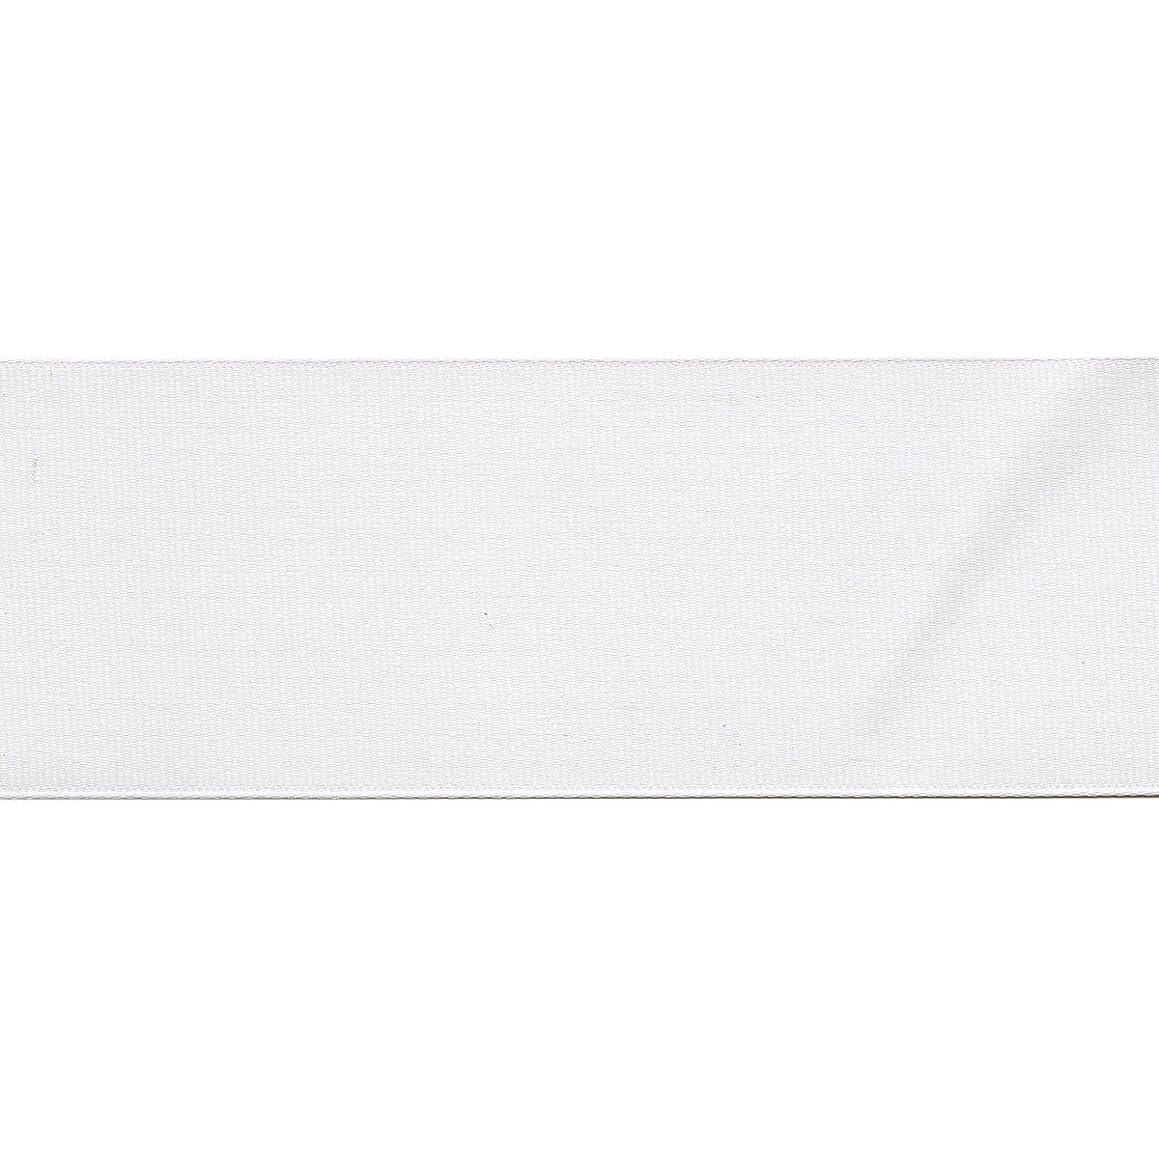 Offray Grosgrain Craft Ribbon, 2 1/4-Inch x 9-Feet, White